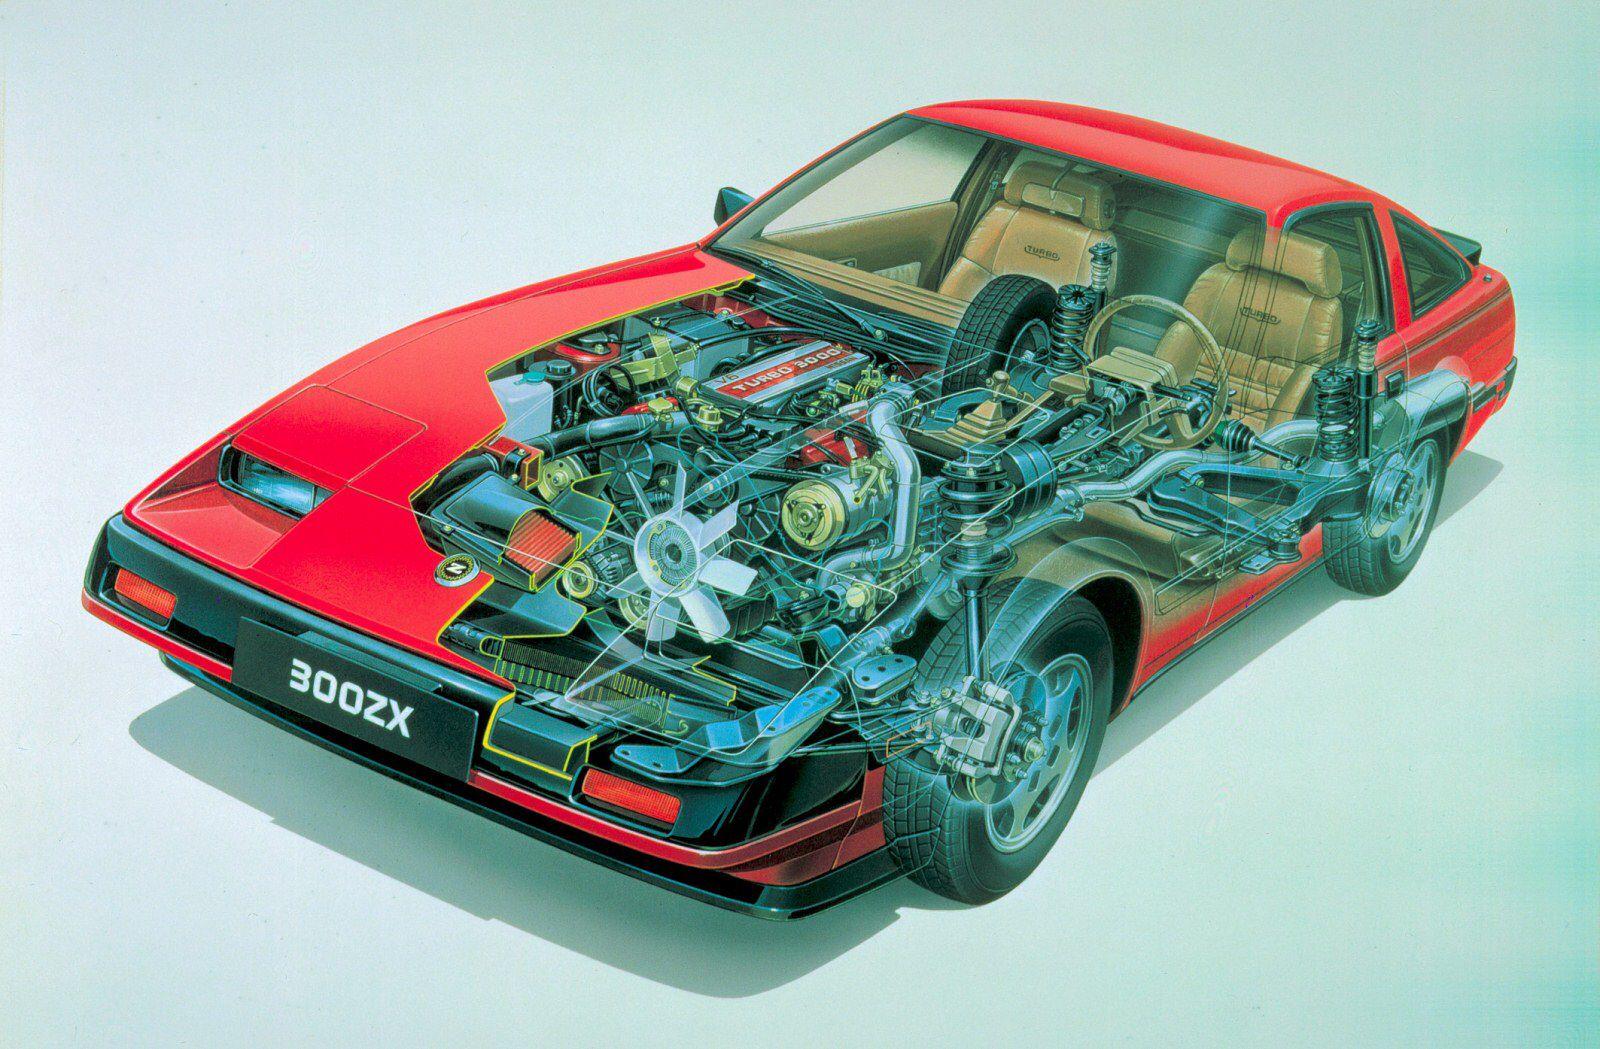 nissan 300zx turbo | hoopties | pinterest | nissan 300zx and nissan